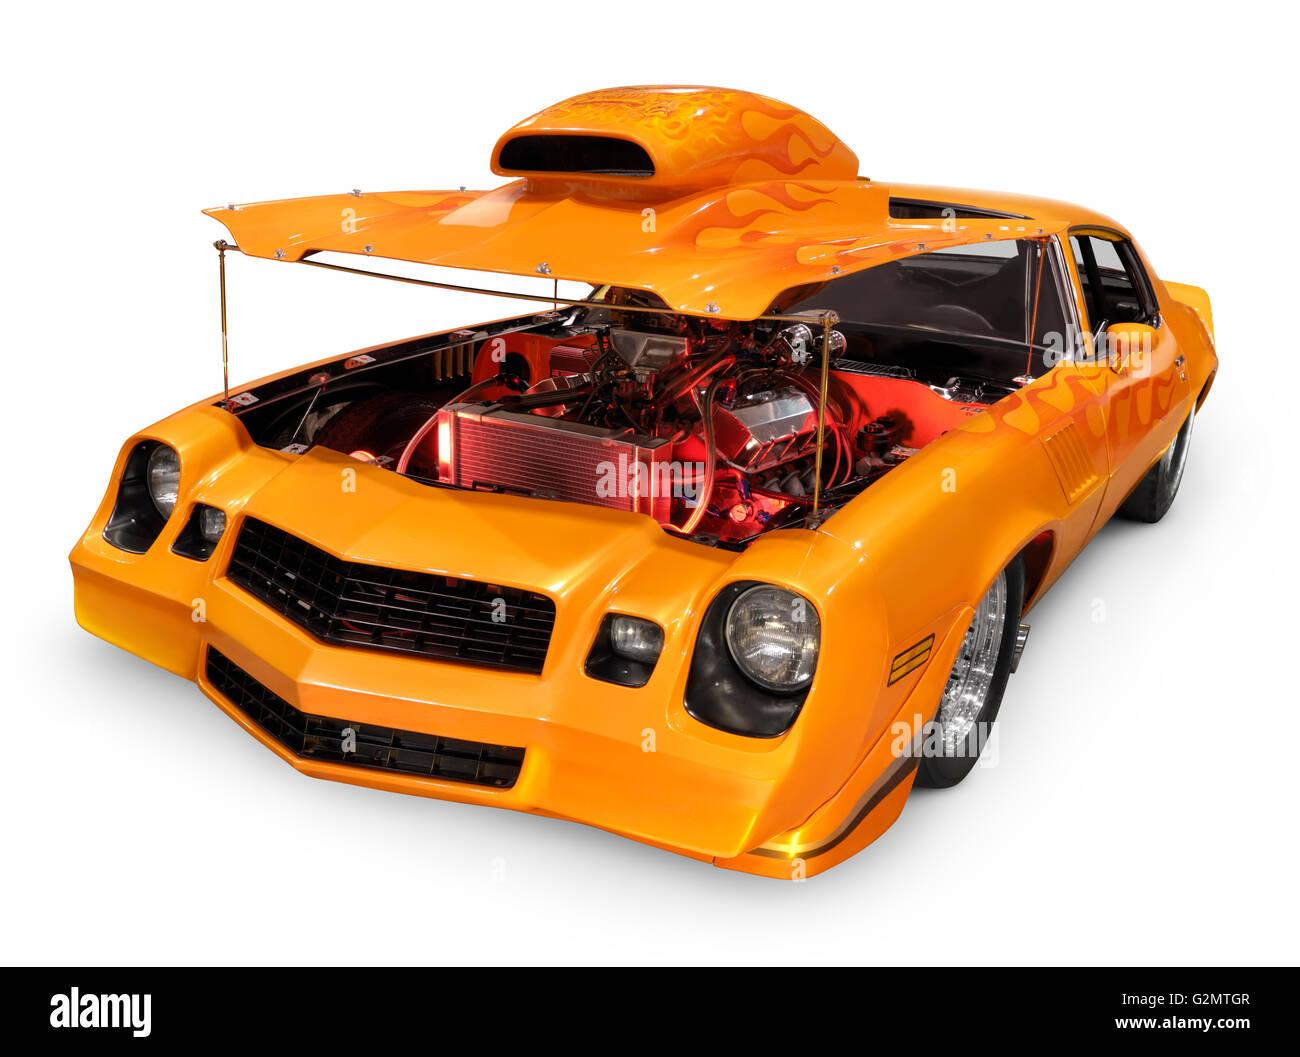 Custom Orange Muscle Car With Open Hood Revealing Powerful Engine